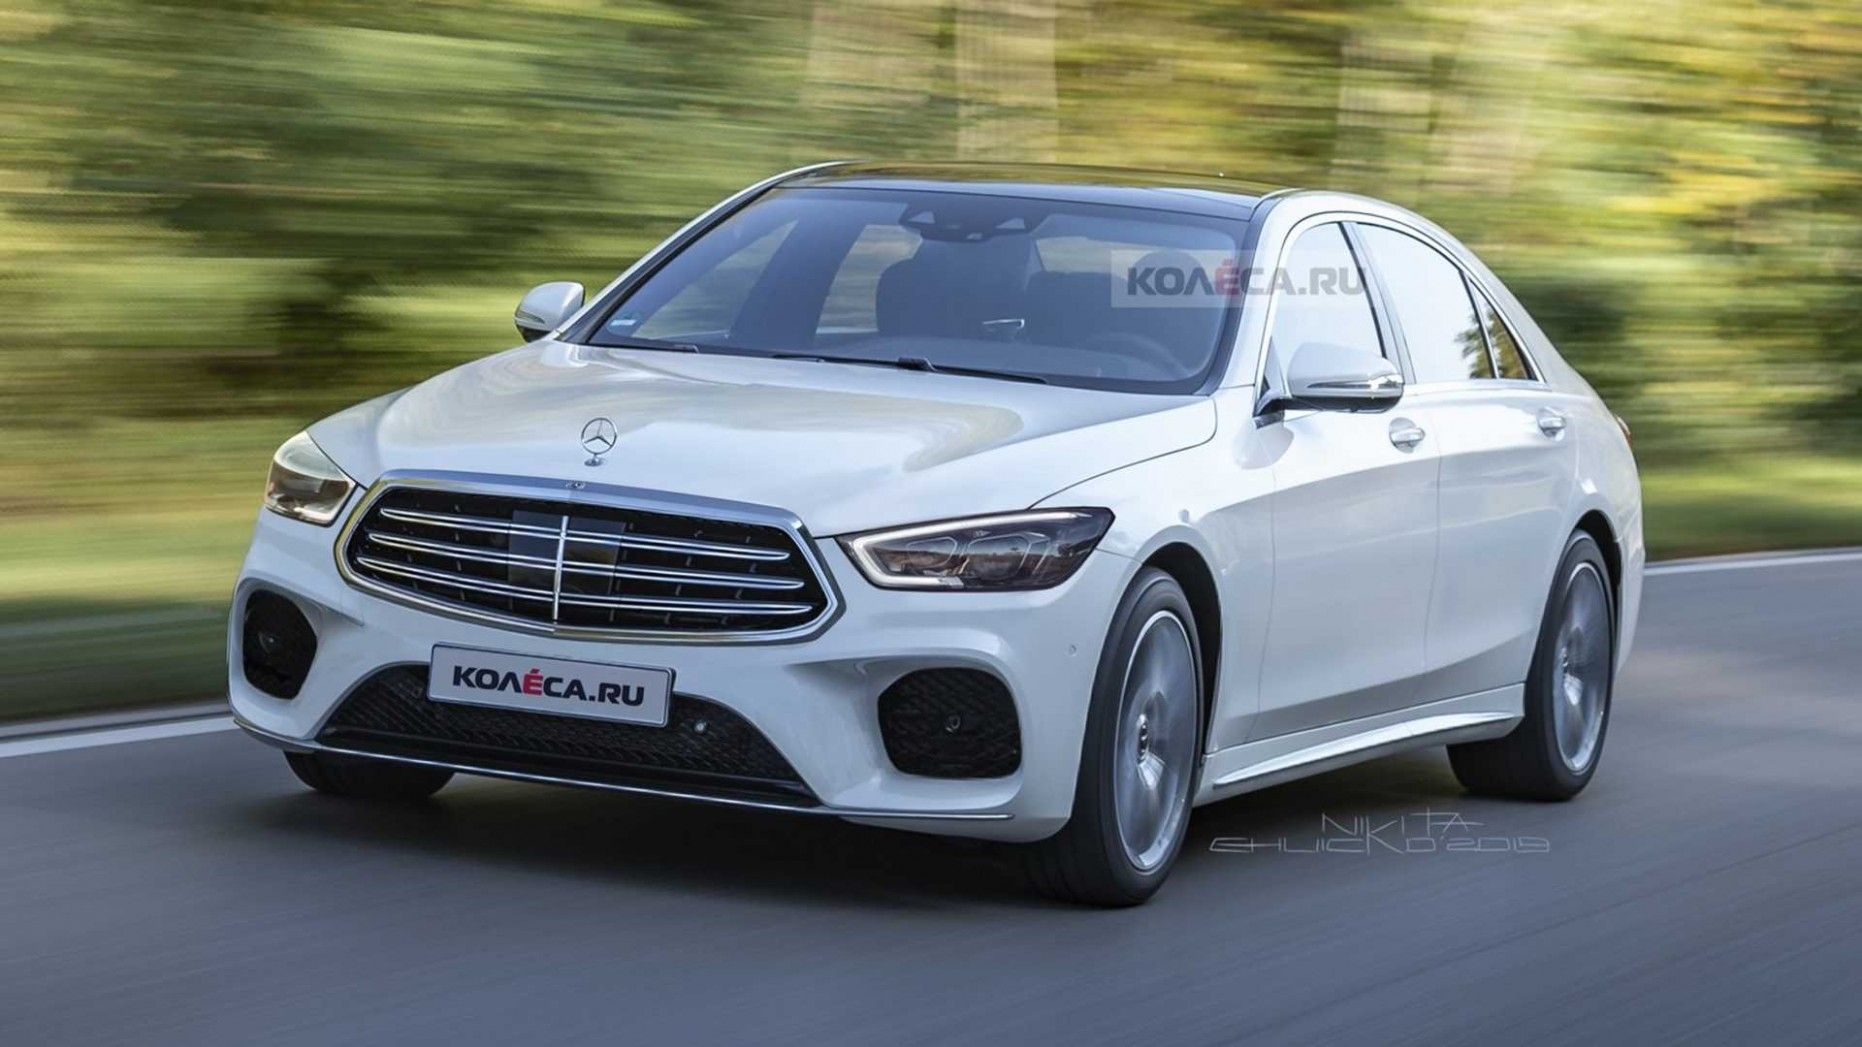 Pin De Herned En Cars Con Imagenes Mercedes Clase S Clase S